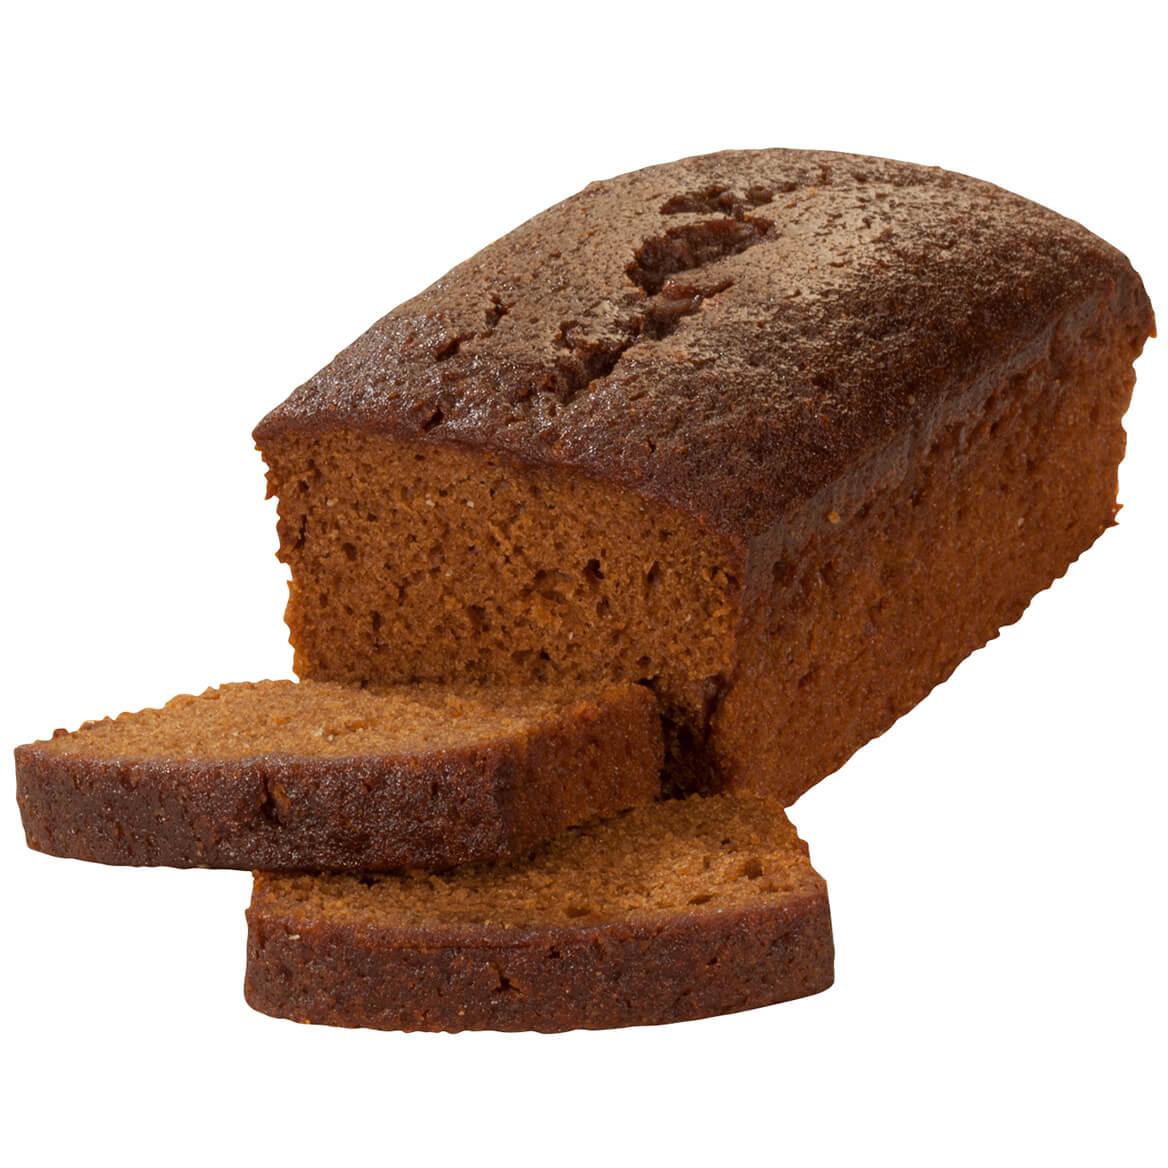 Irish Crème Dessert Cake 14 oz.